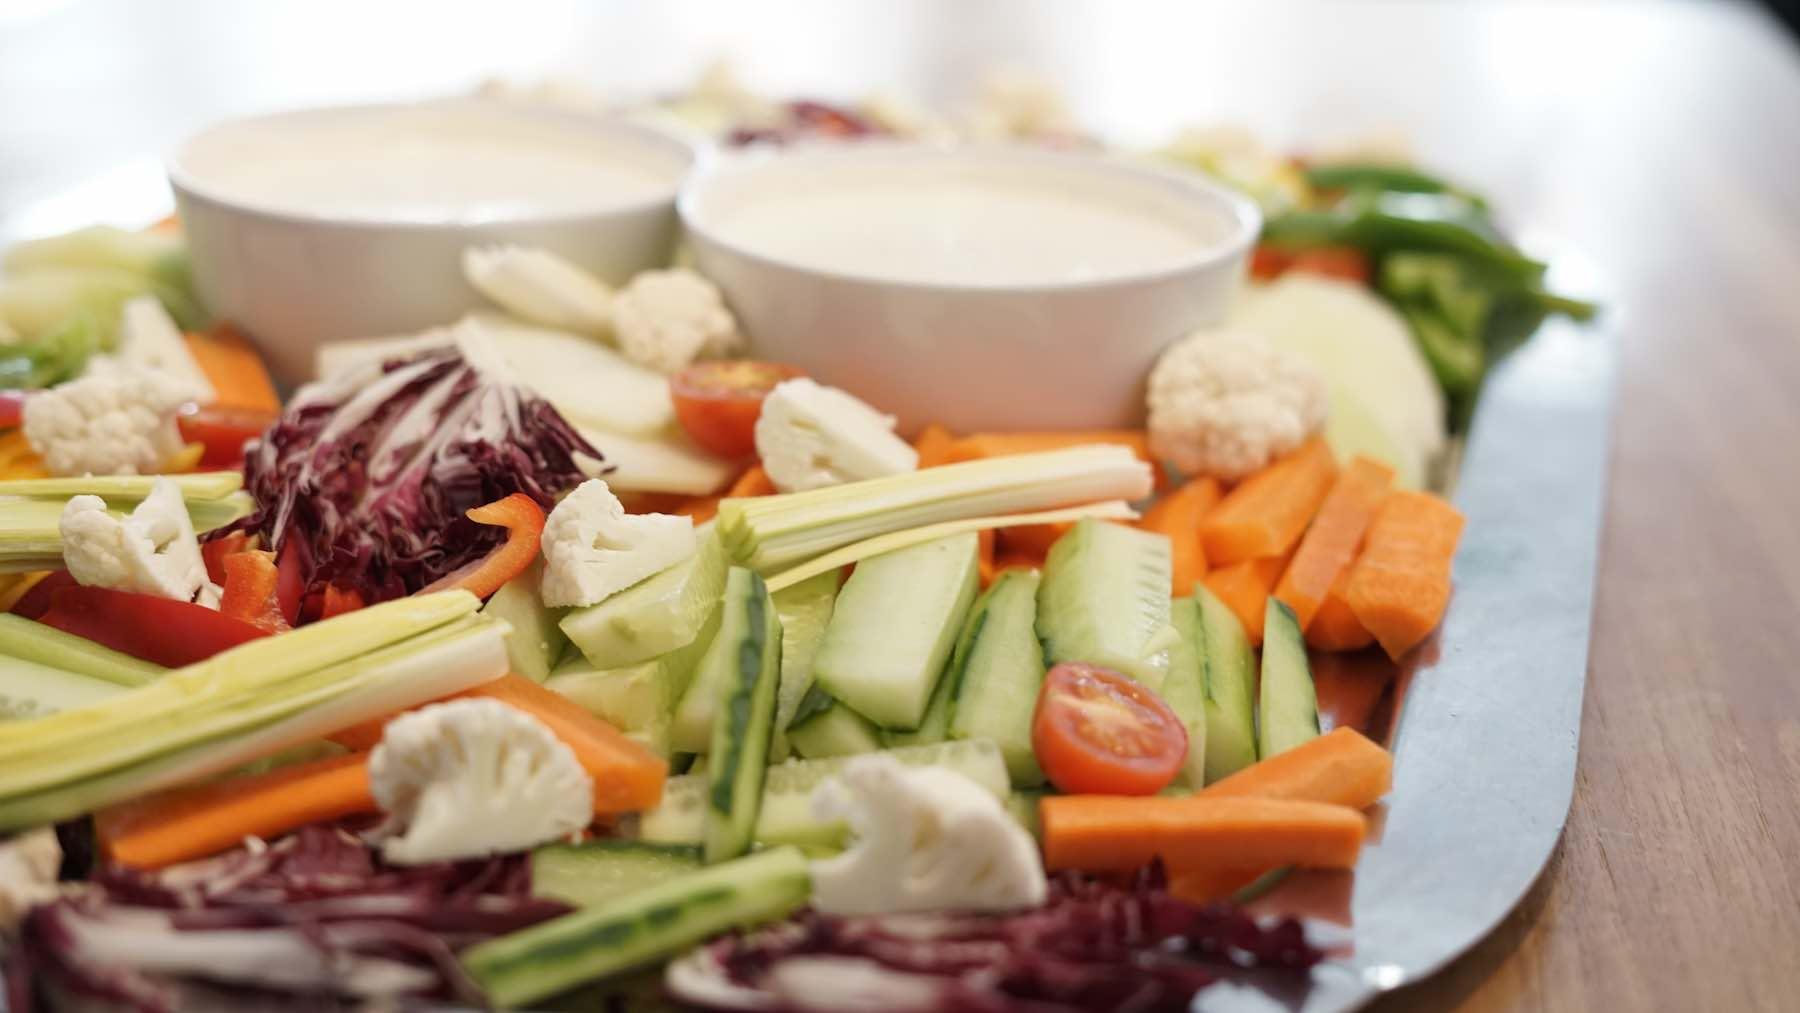 Gemüseplatte Bad Homburg vor der Höhe Catering